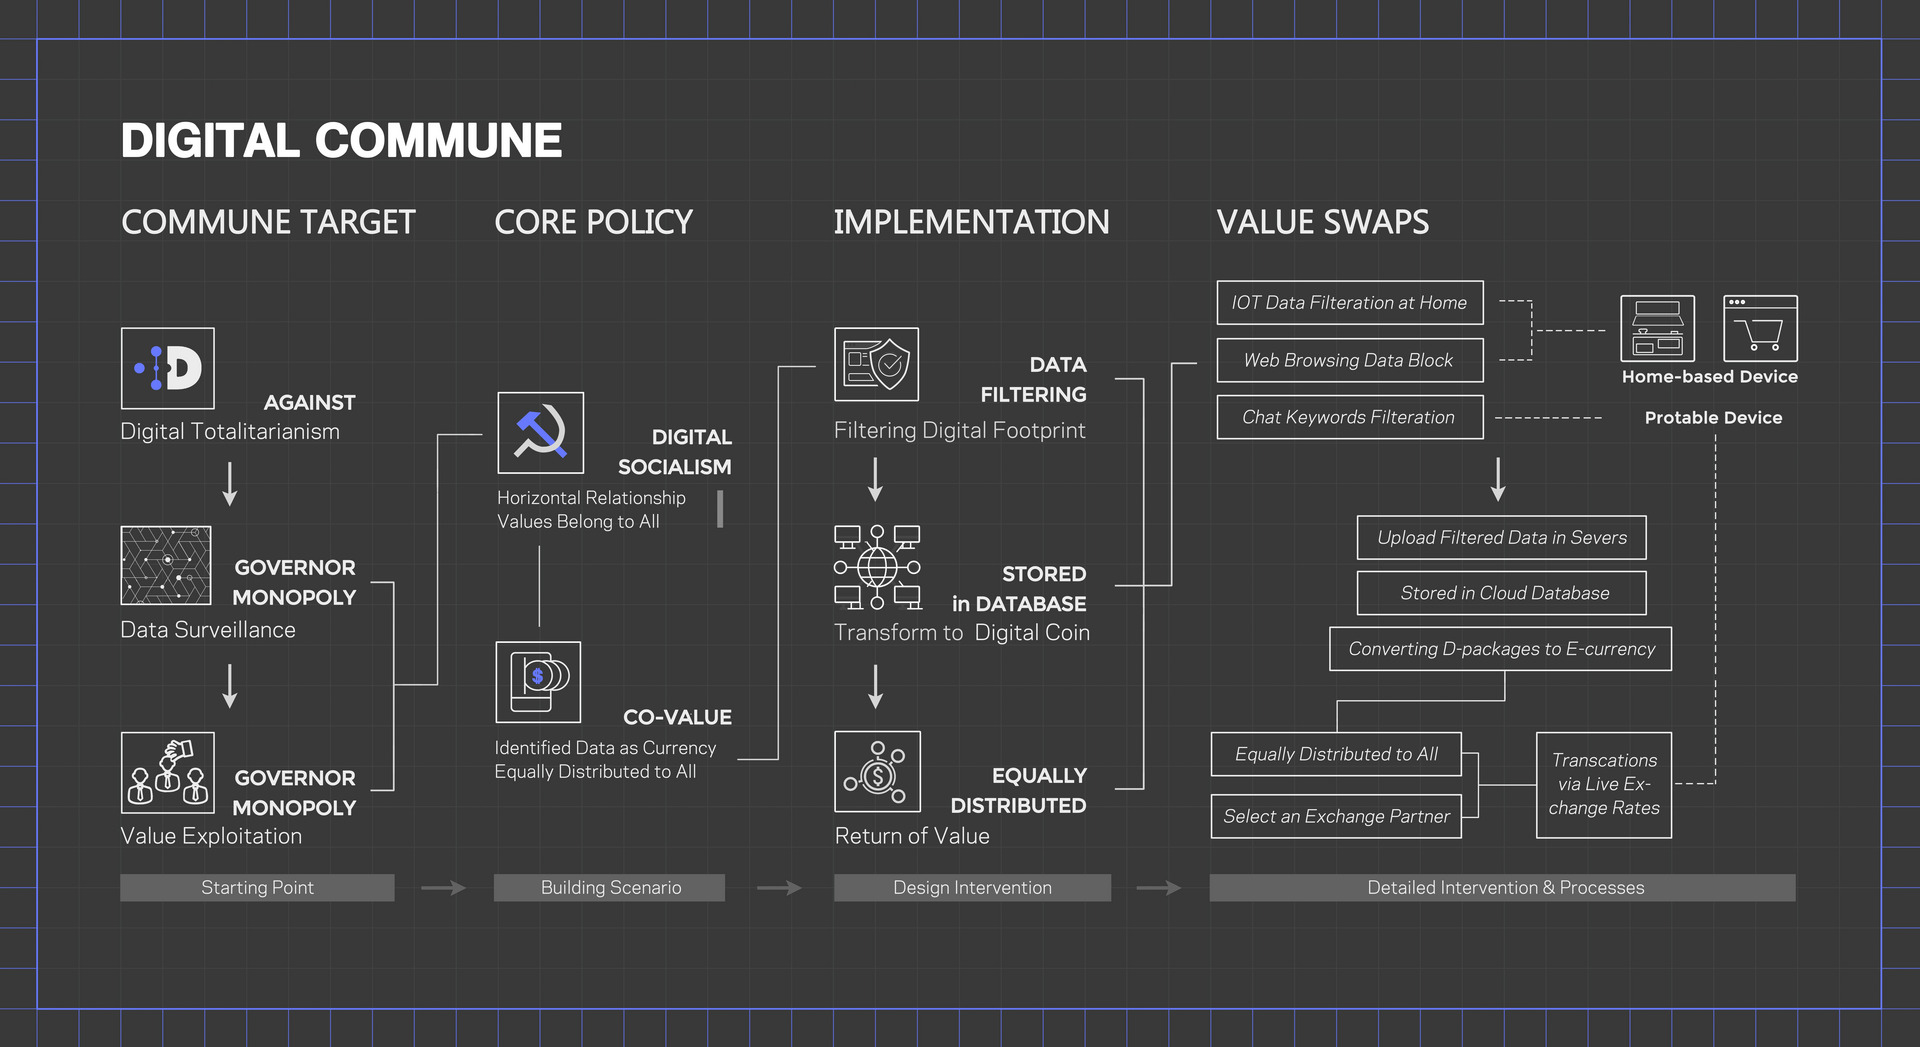 Scenario Diagram — Demonstrate how the Cybertonia Digital Commune works